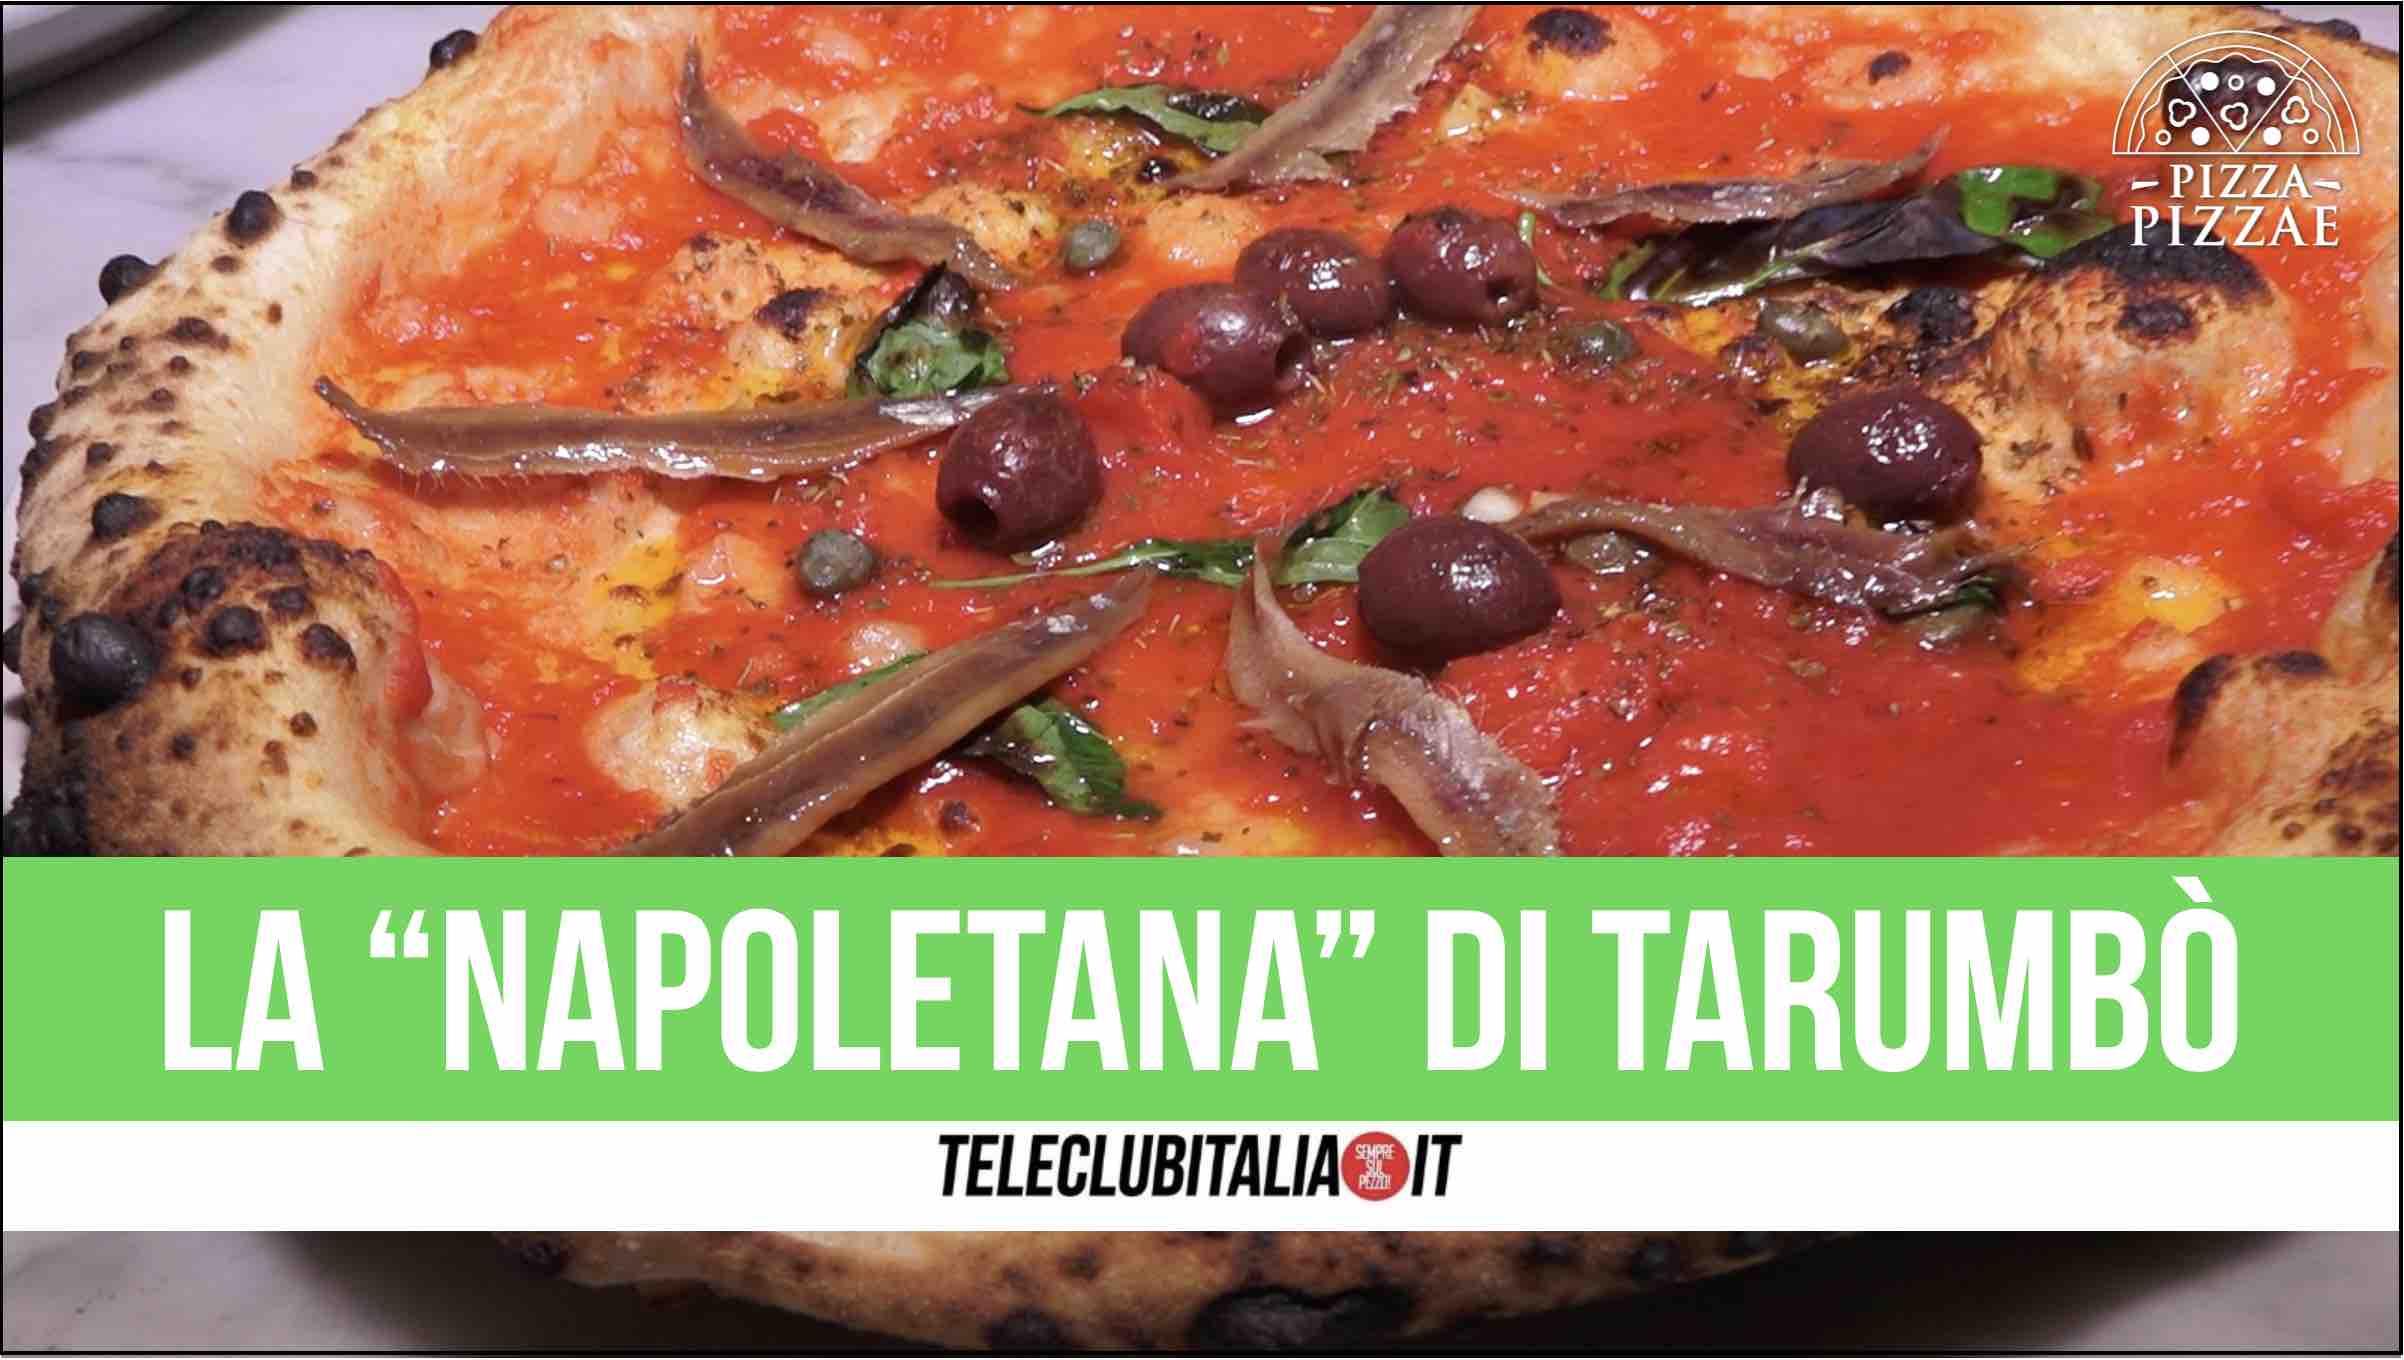 pizza tarumbo' sant arpino lendi teatro napoletana